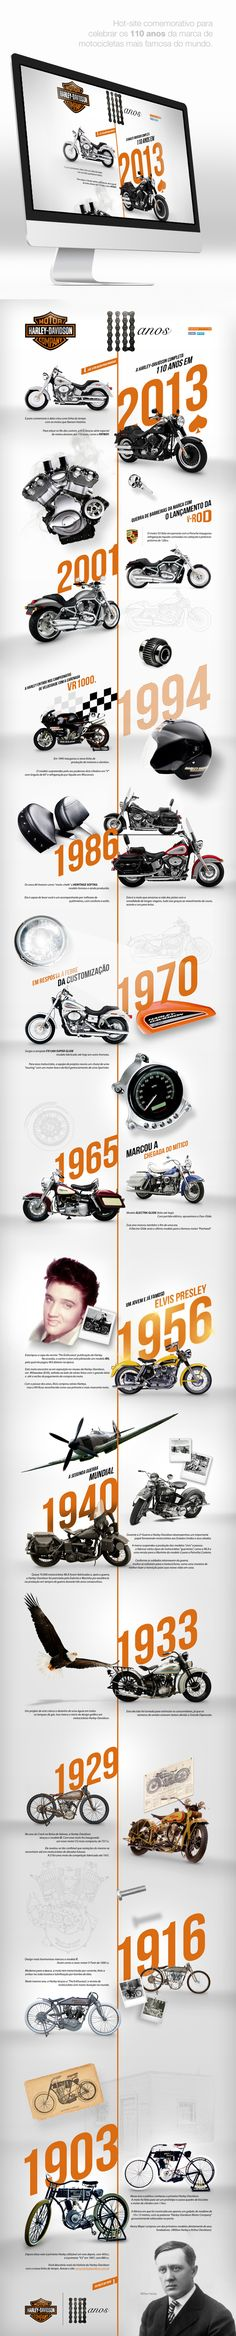 pinterest.com/fra411 #webdesign - HARLEY DAVIDSON - Hot Site 110 Anos - HTML5